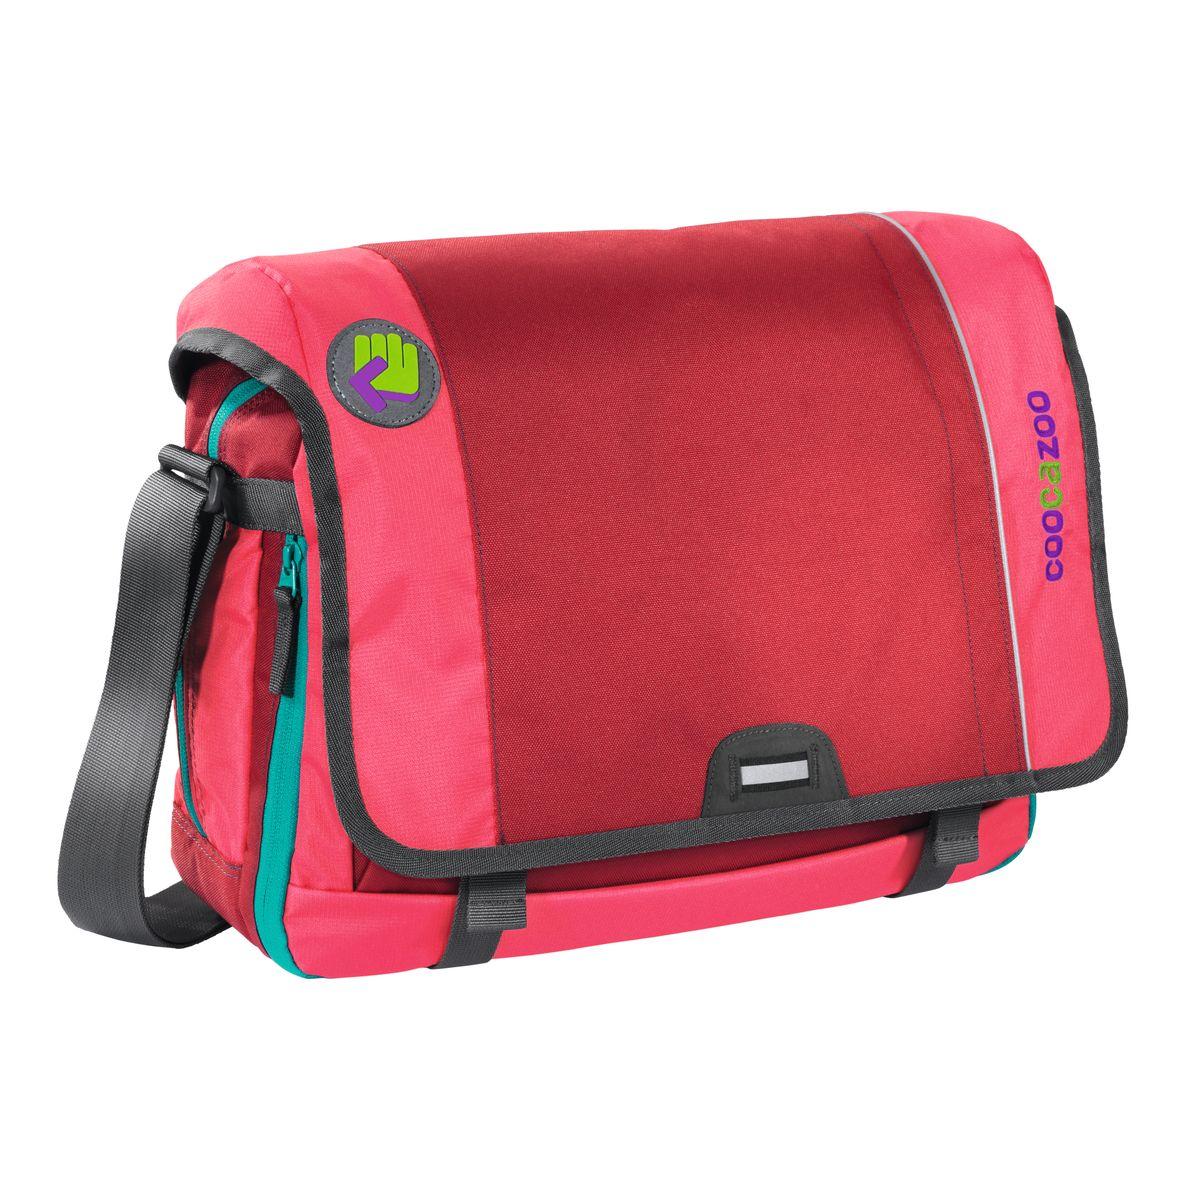 Hama Сумка Coocazoo HangDang Rio Red сумка спортивная coocazoo sporterporter lime district 00129143